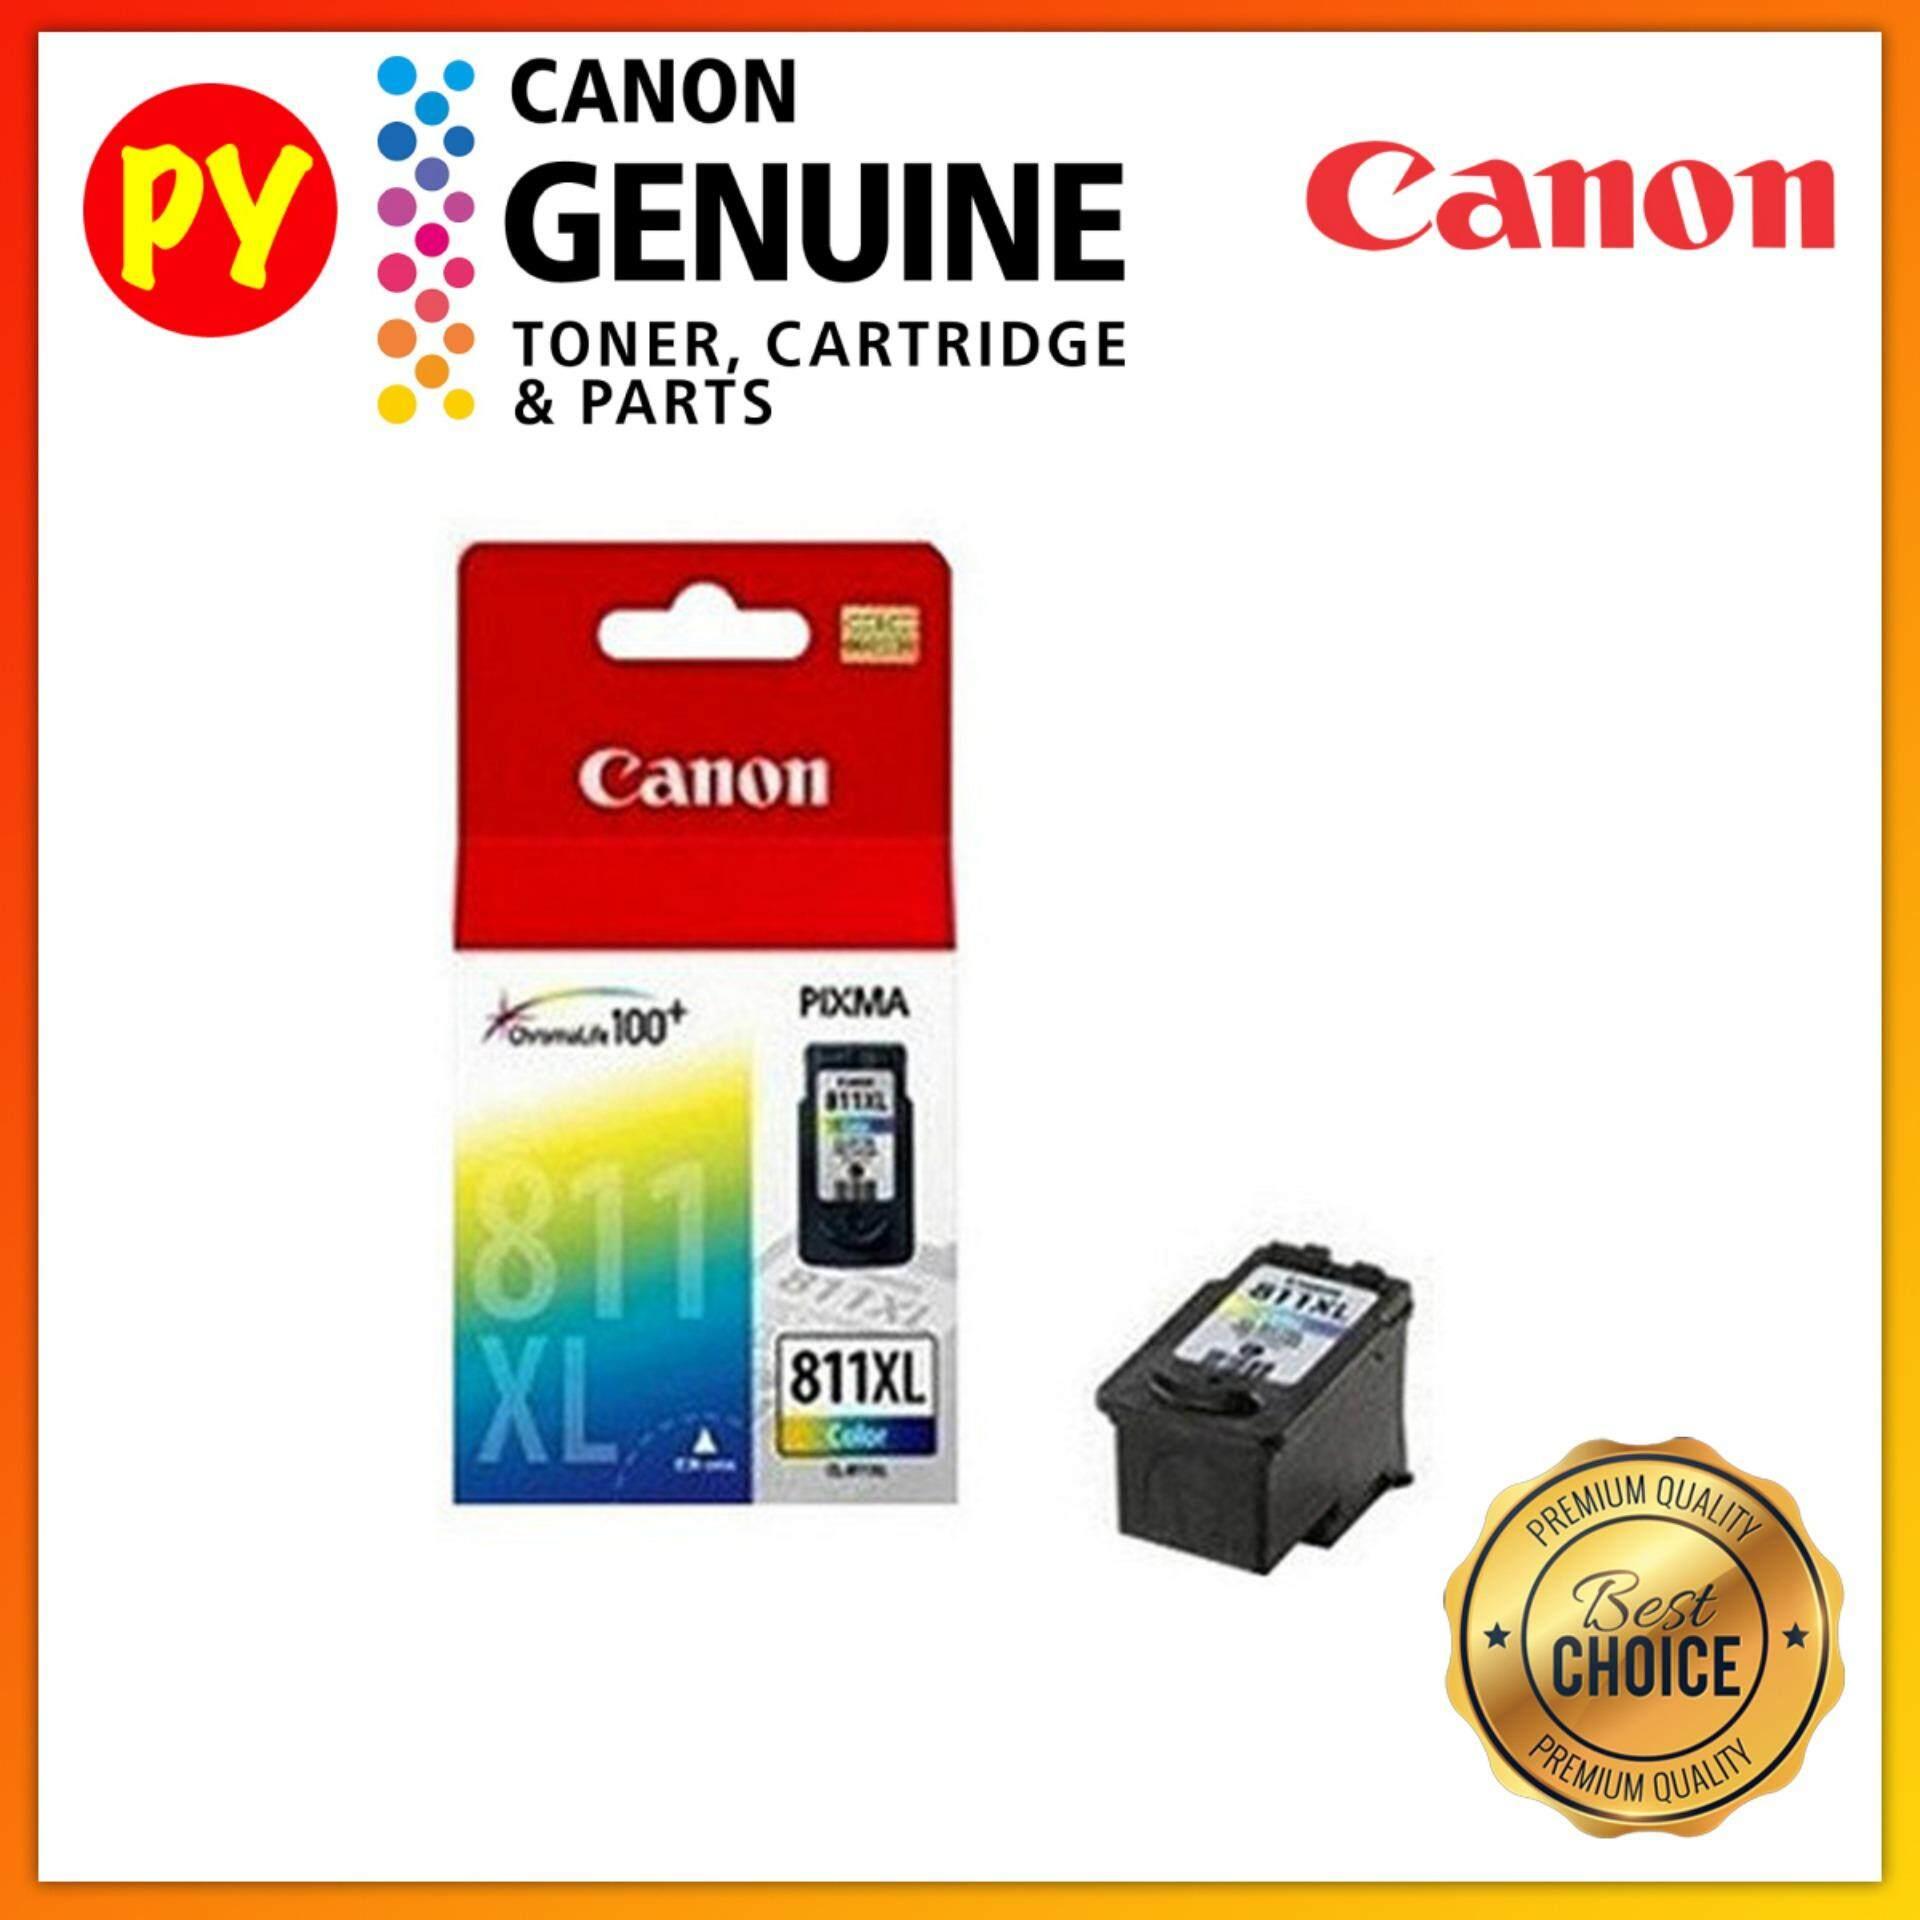 Canon CL-811 XL Color Original Ink Cartridge - for Canon Pixma iP2772/ MP237/ MP245/ MP258/ MP276/ MP287/ MP486/ MP496/ MP497/ MX328/ MX338/ MX347/ MX357/ MX366/ MX416/ MX426 printers